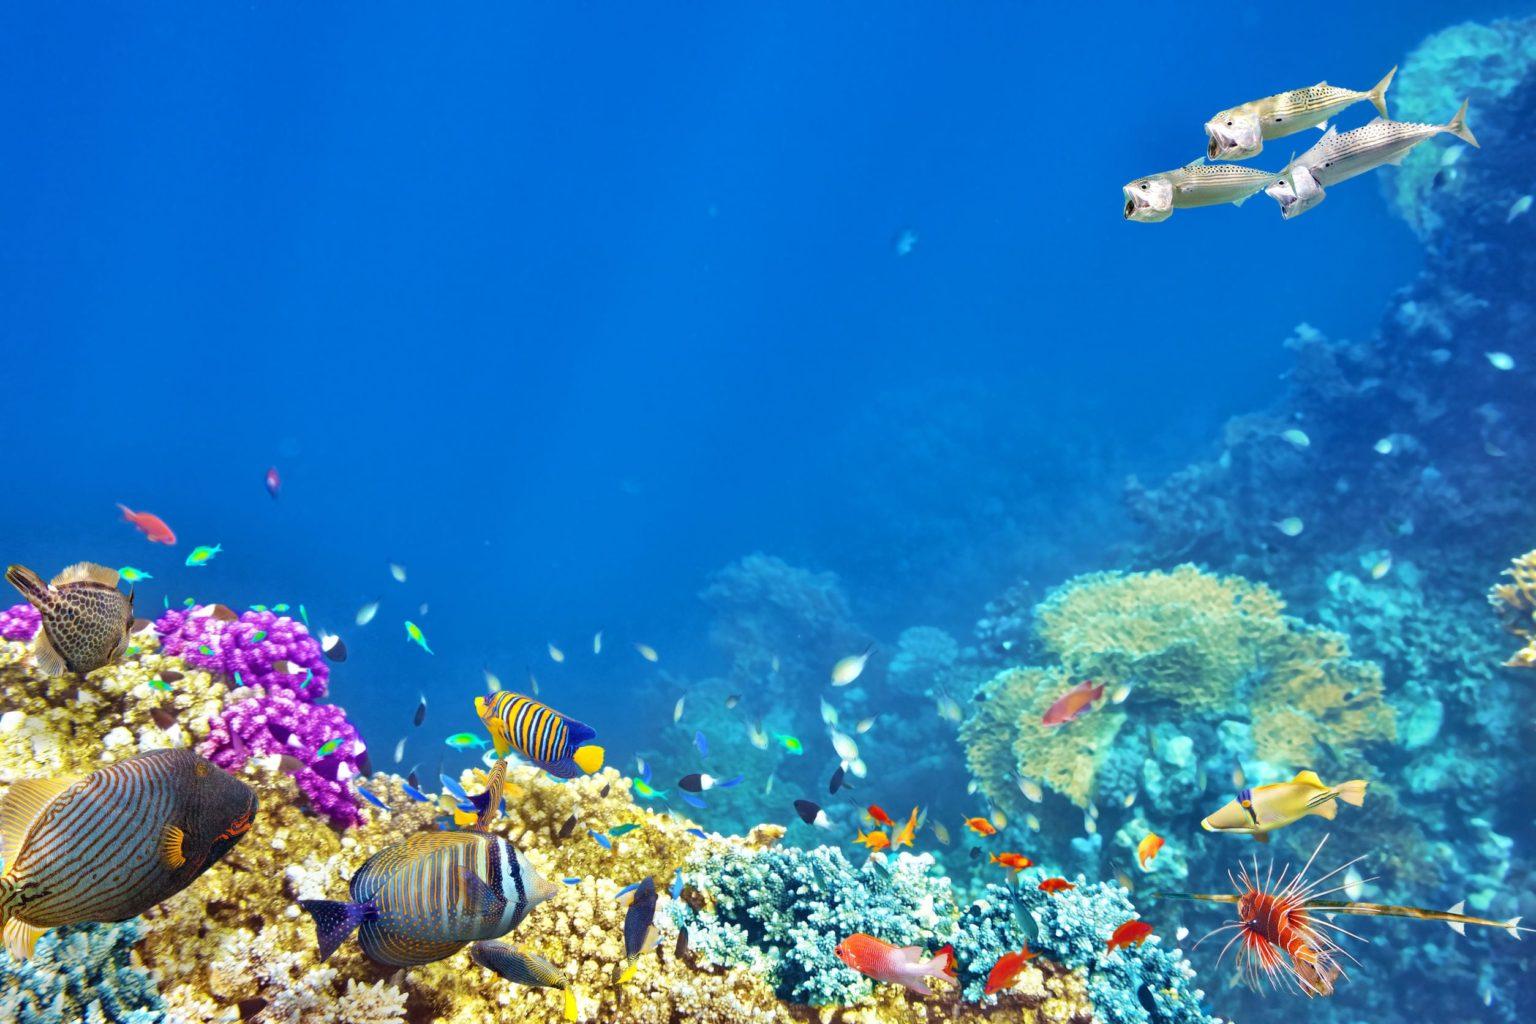 microbeads affect ocean life